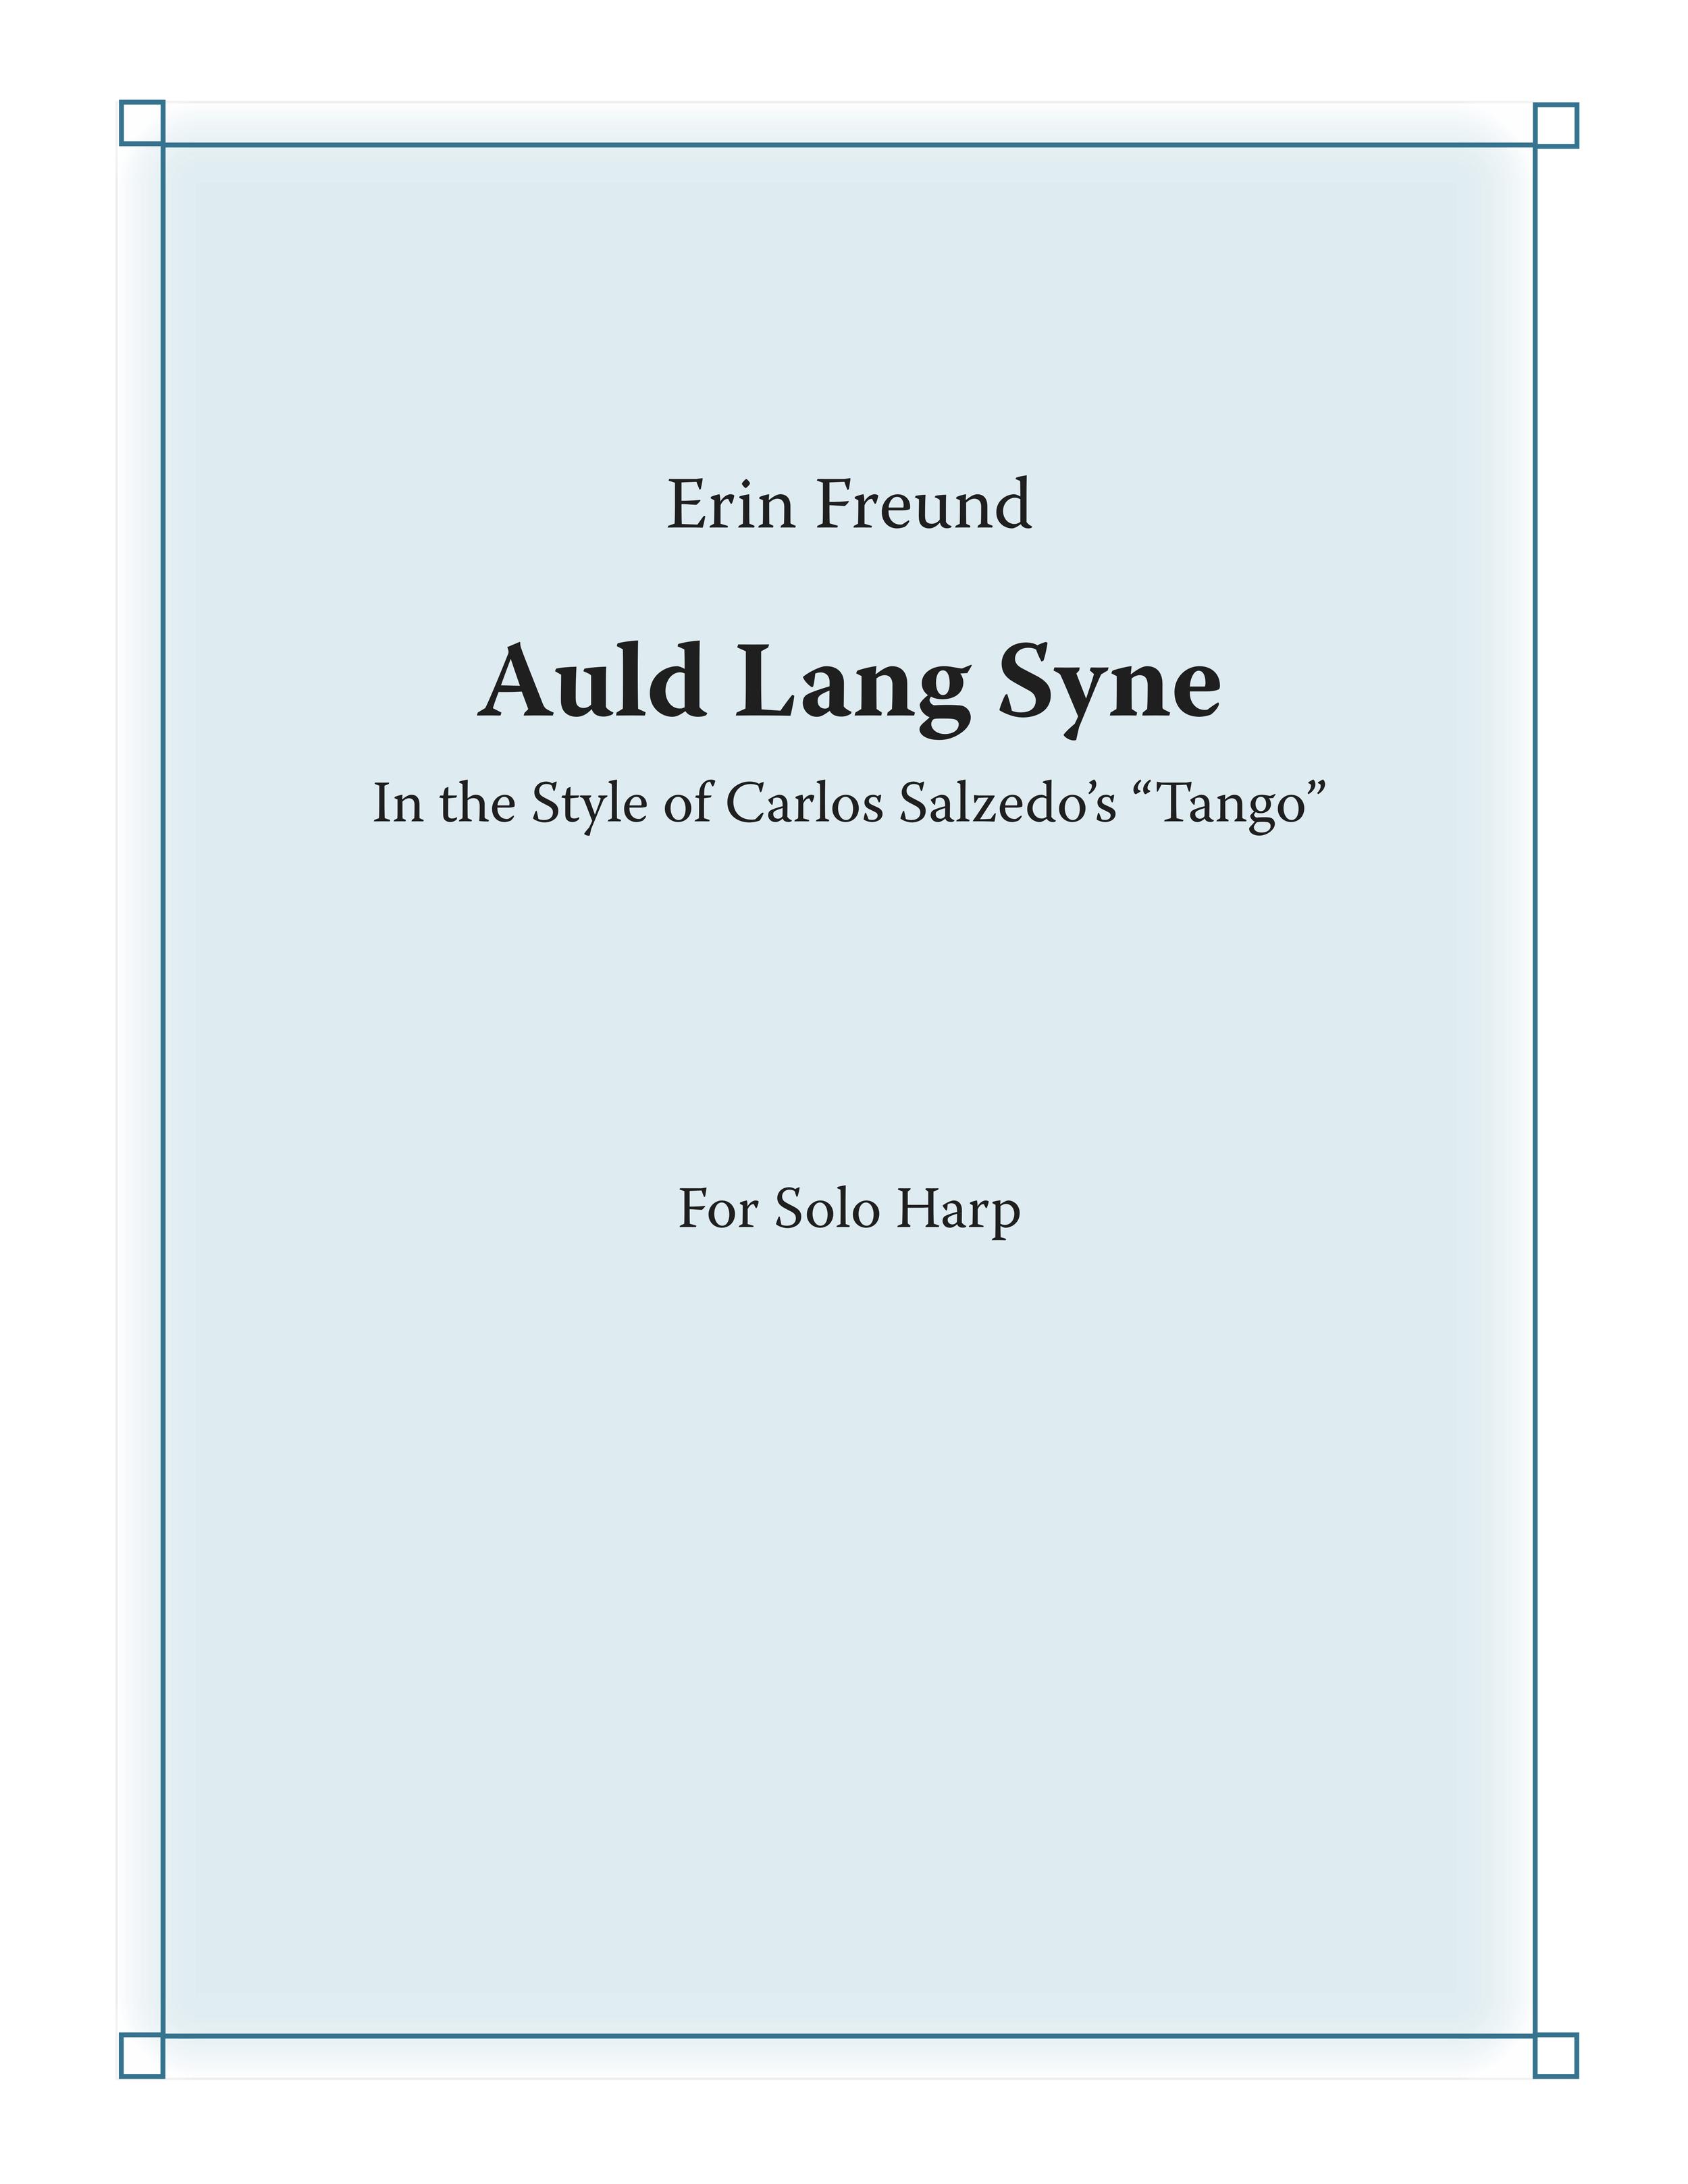 Auld Lang Syne Tango cover.jpg